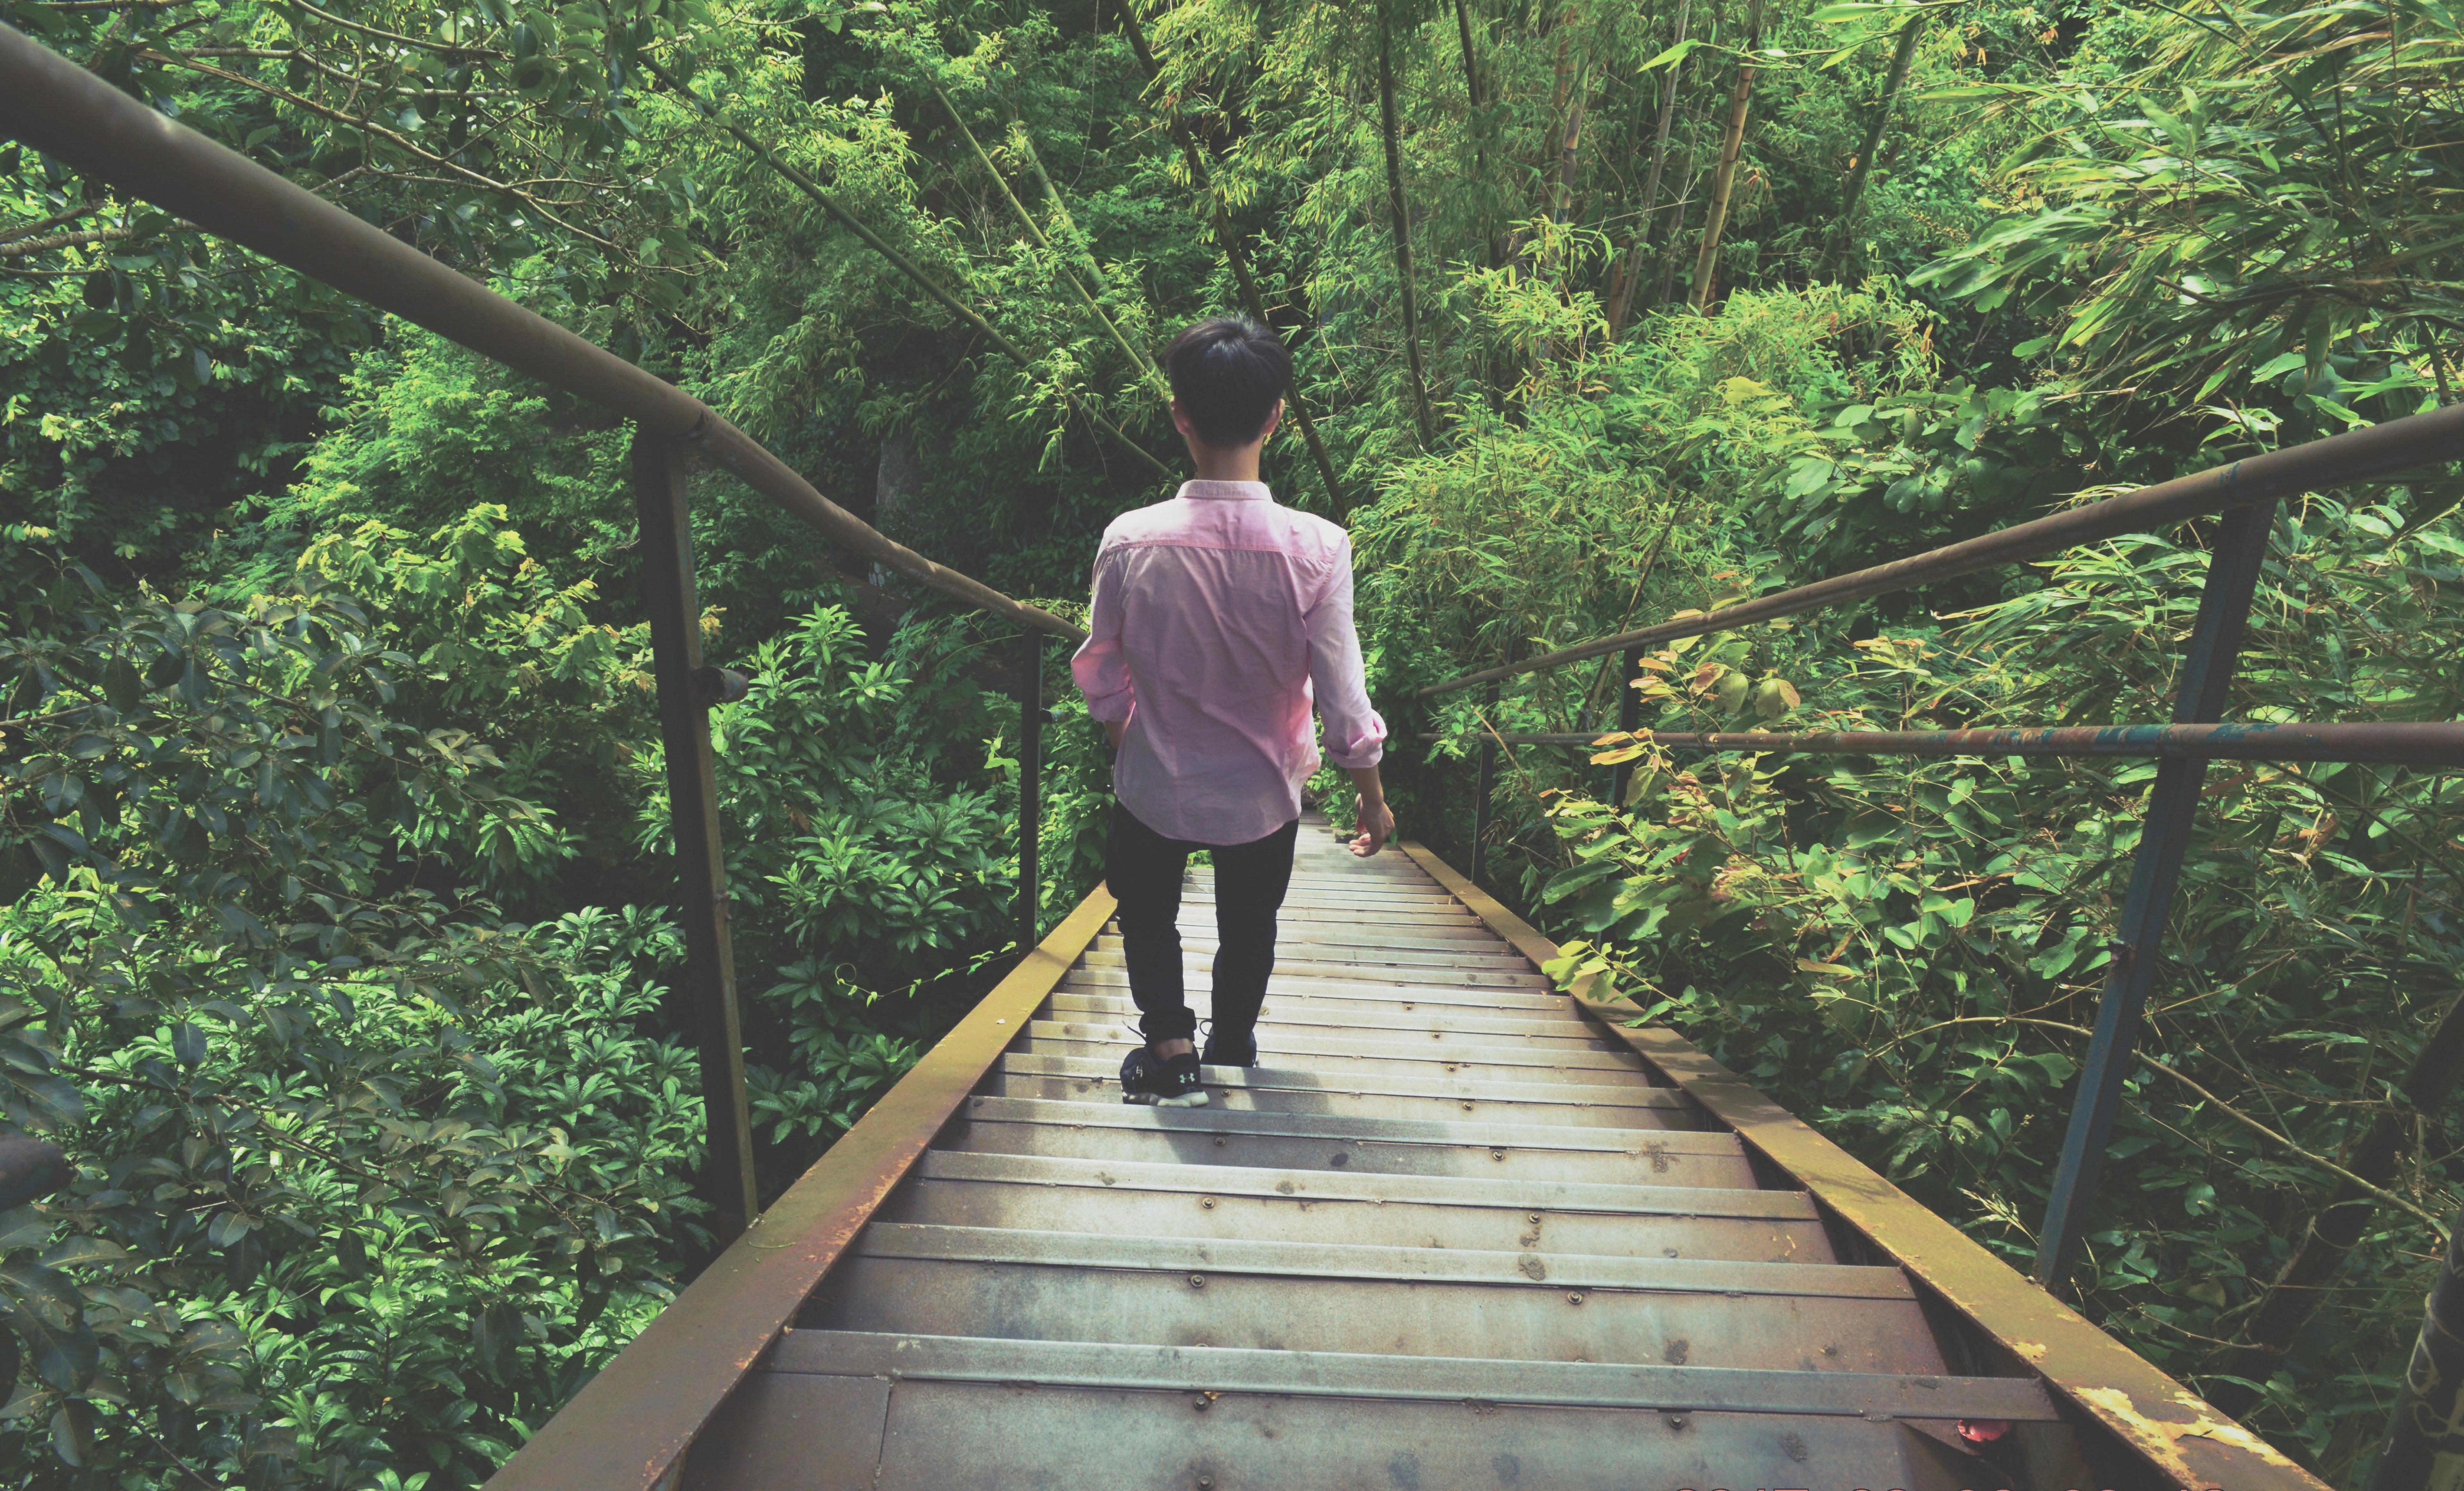 Man Wearing Pink Dress Shirt Walking Through Stairs, Adventure, Outdoors, Trees, Travel, HQ Photo